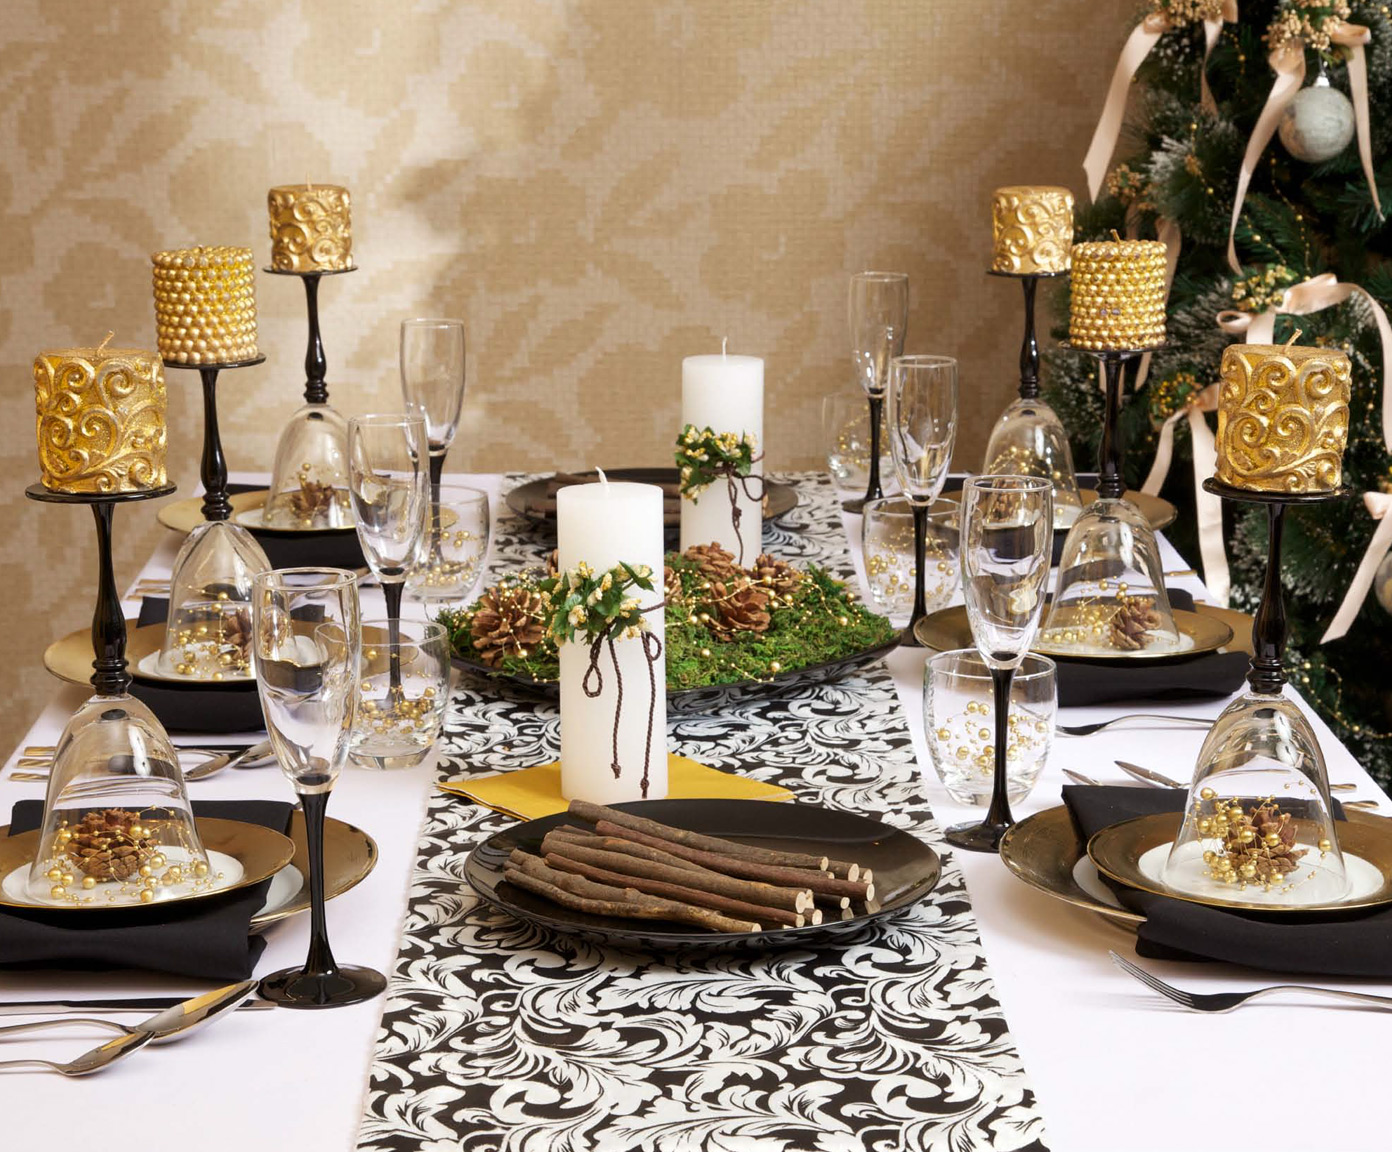 serverovka-stola